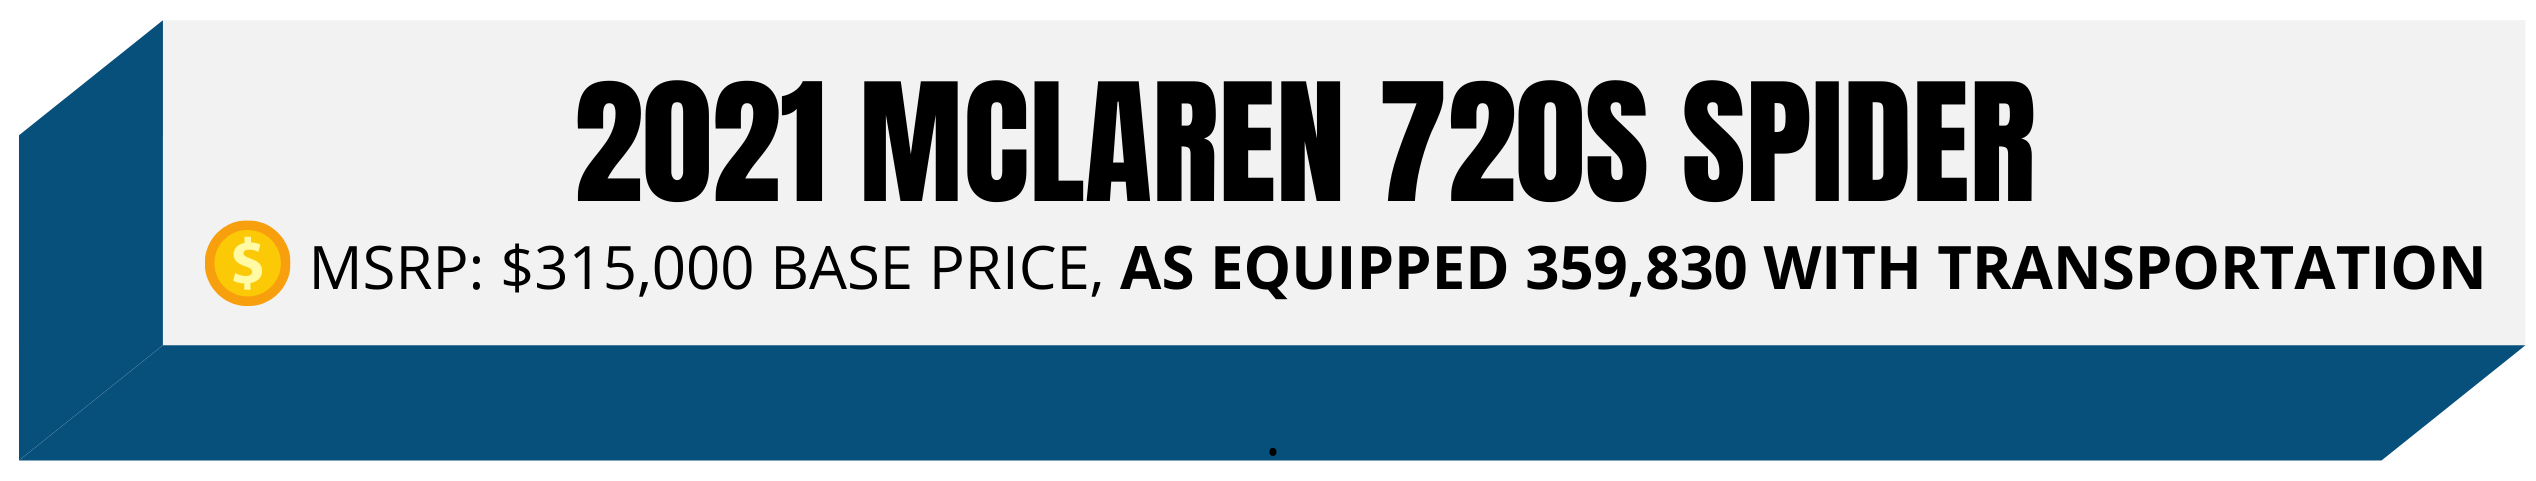 mclaren-720s-graphic